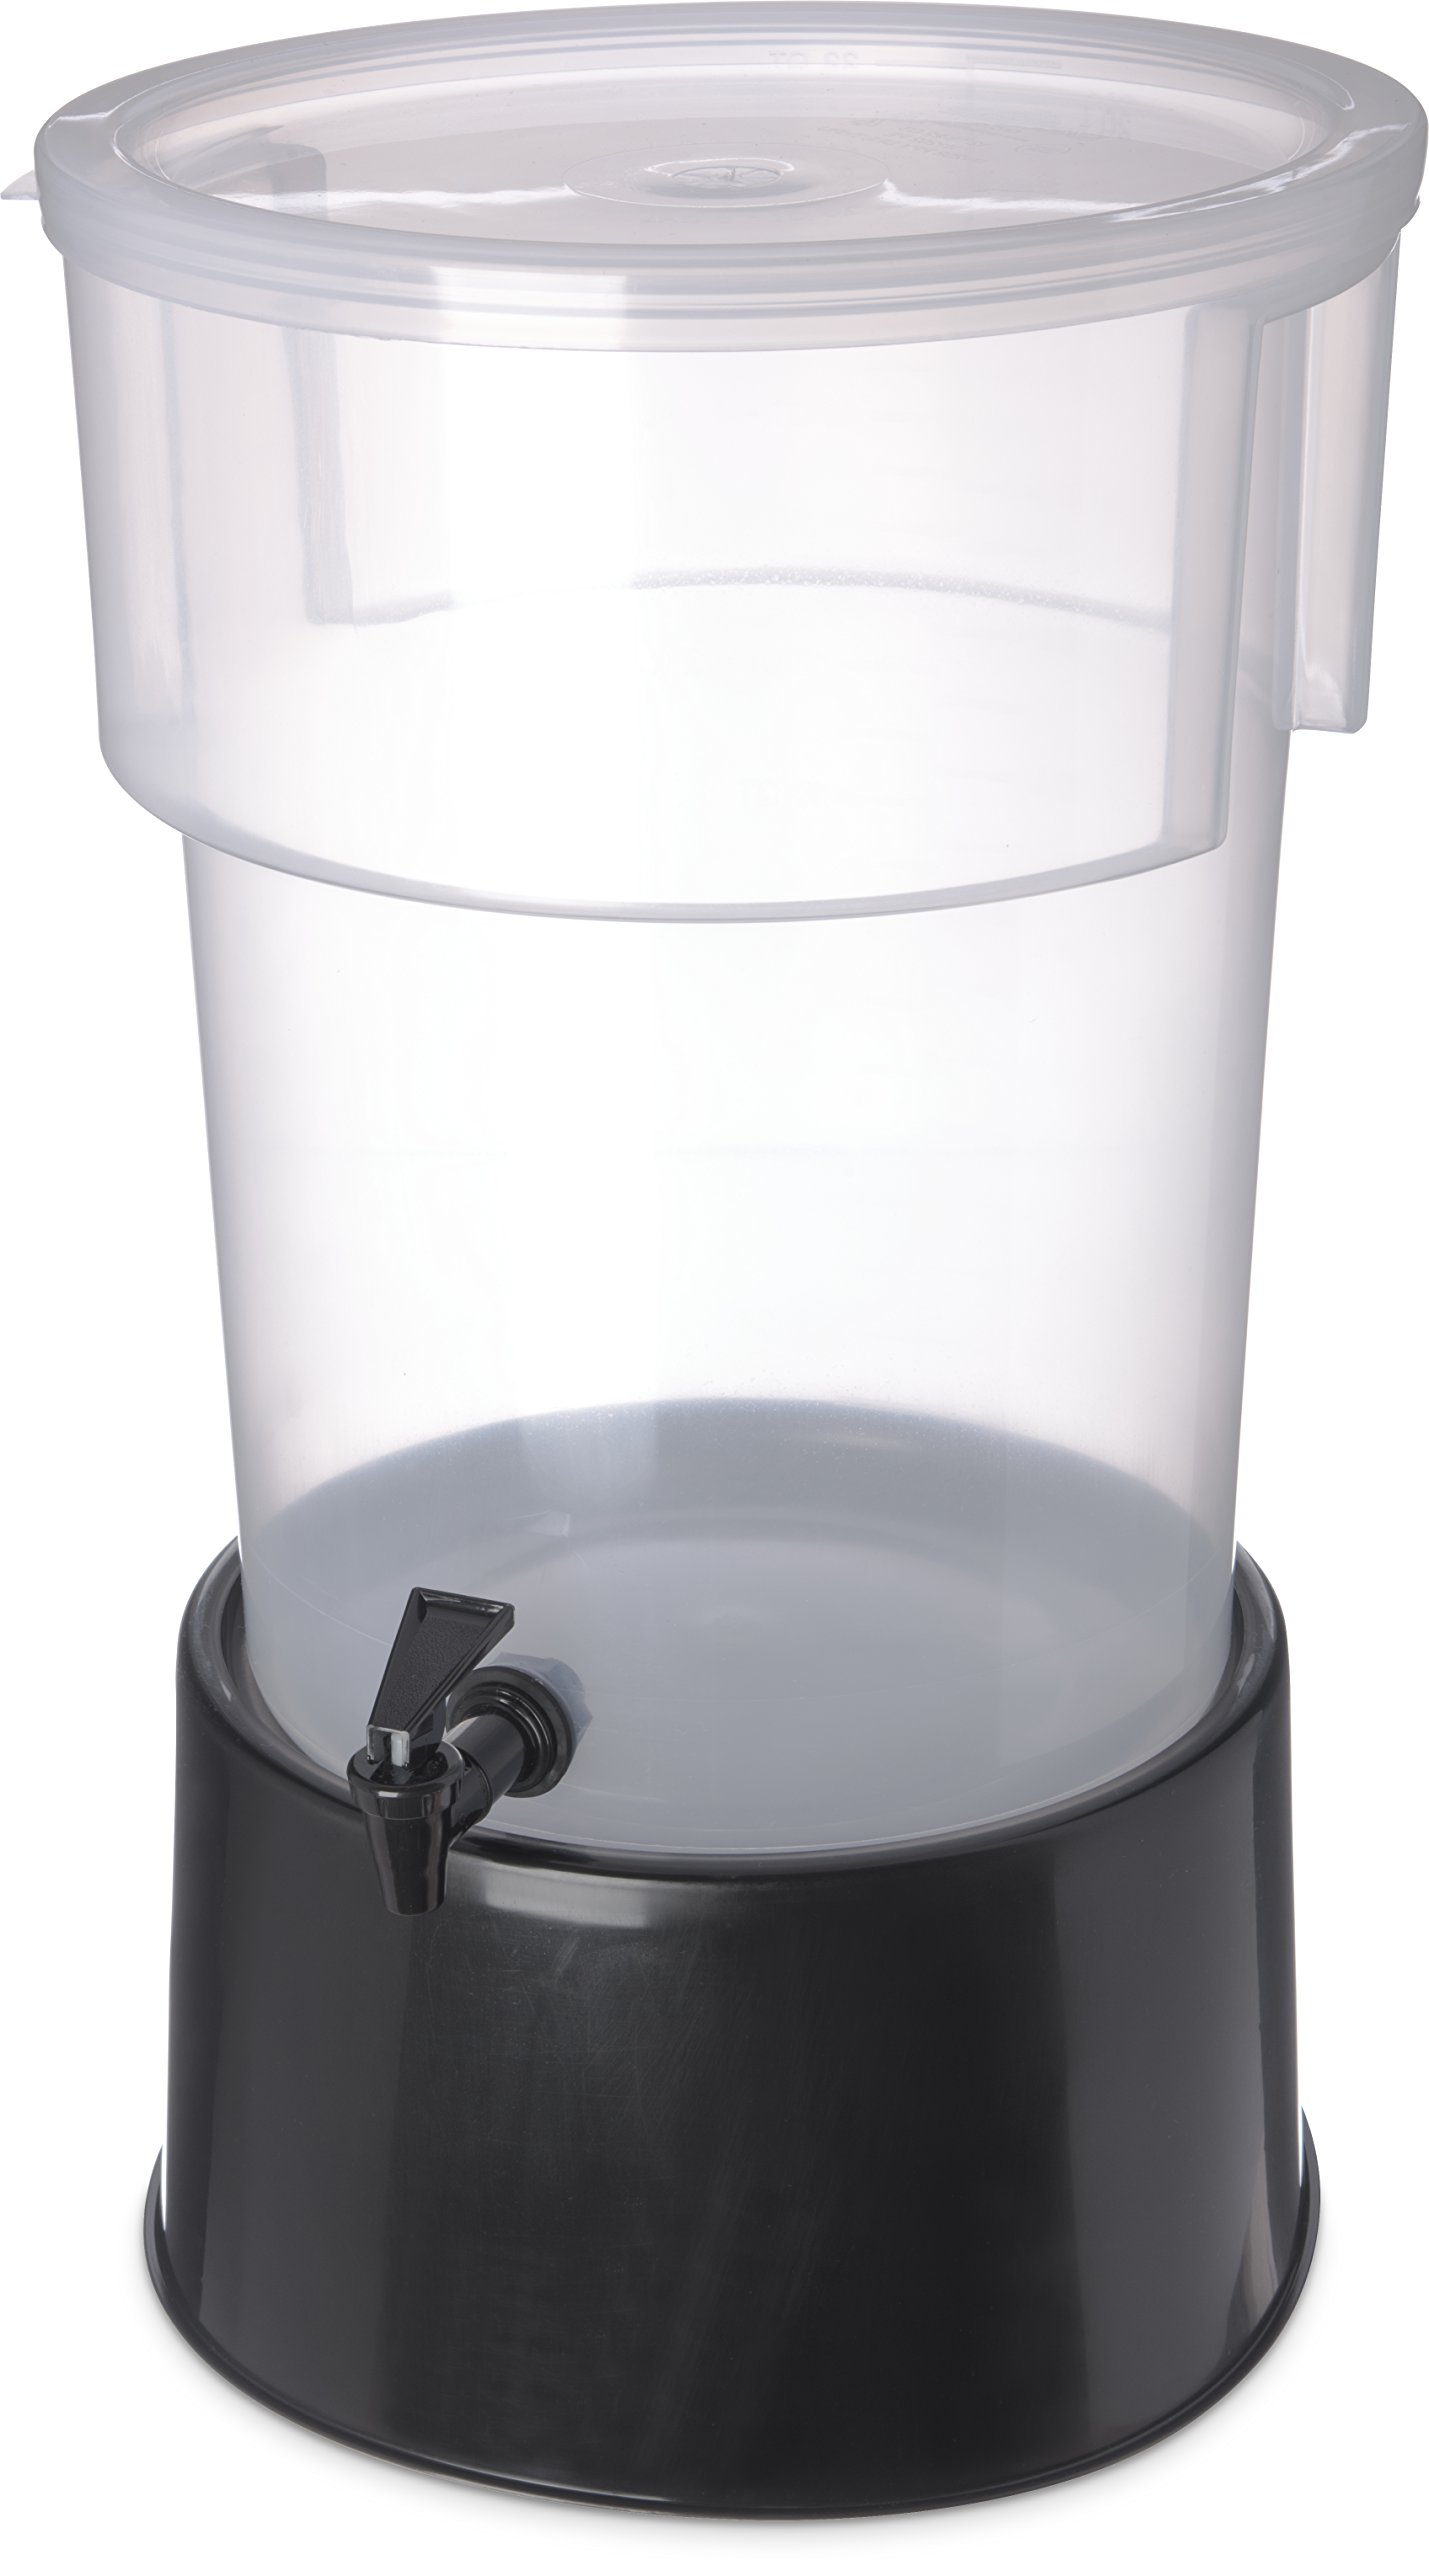 Carlisle 222903 Break-Resistant Beverage Dispenser with Base, 5 Gallon, Clear